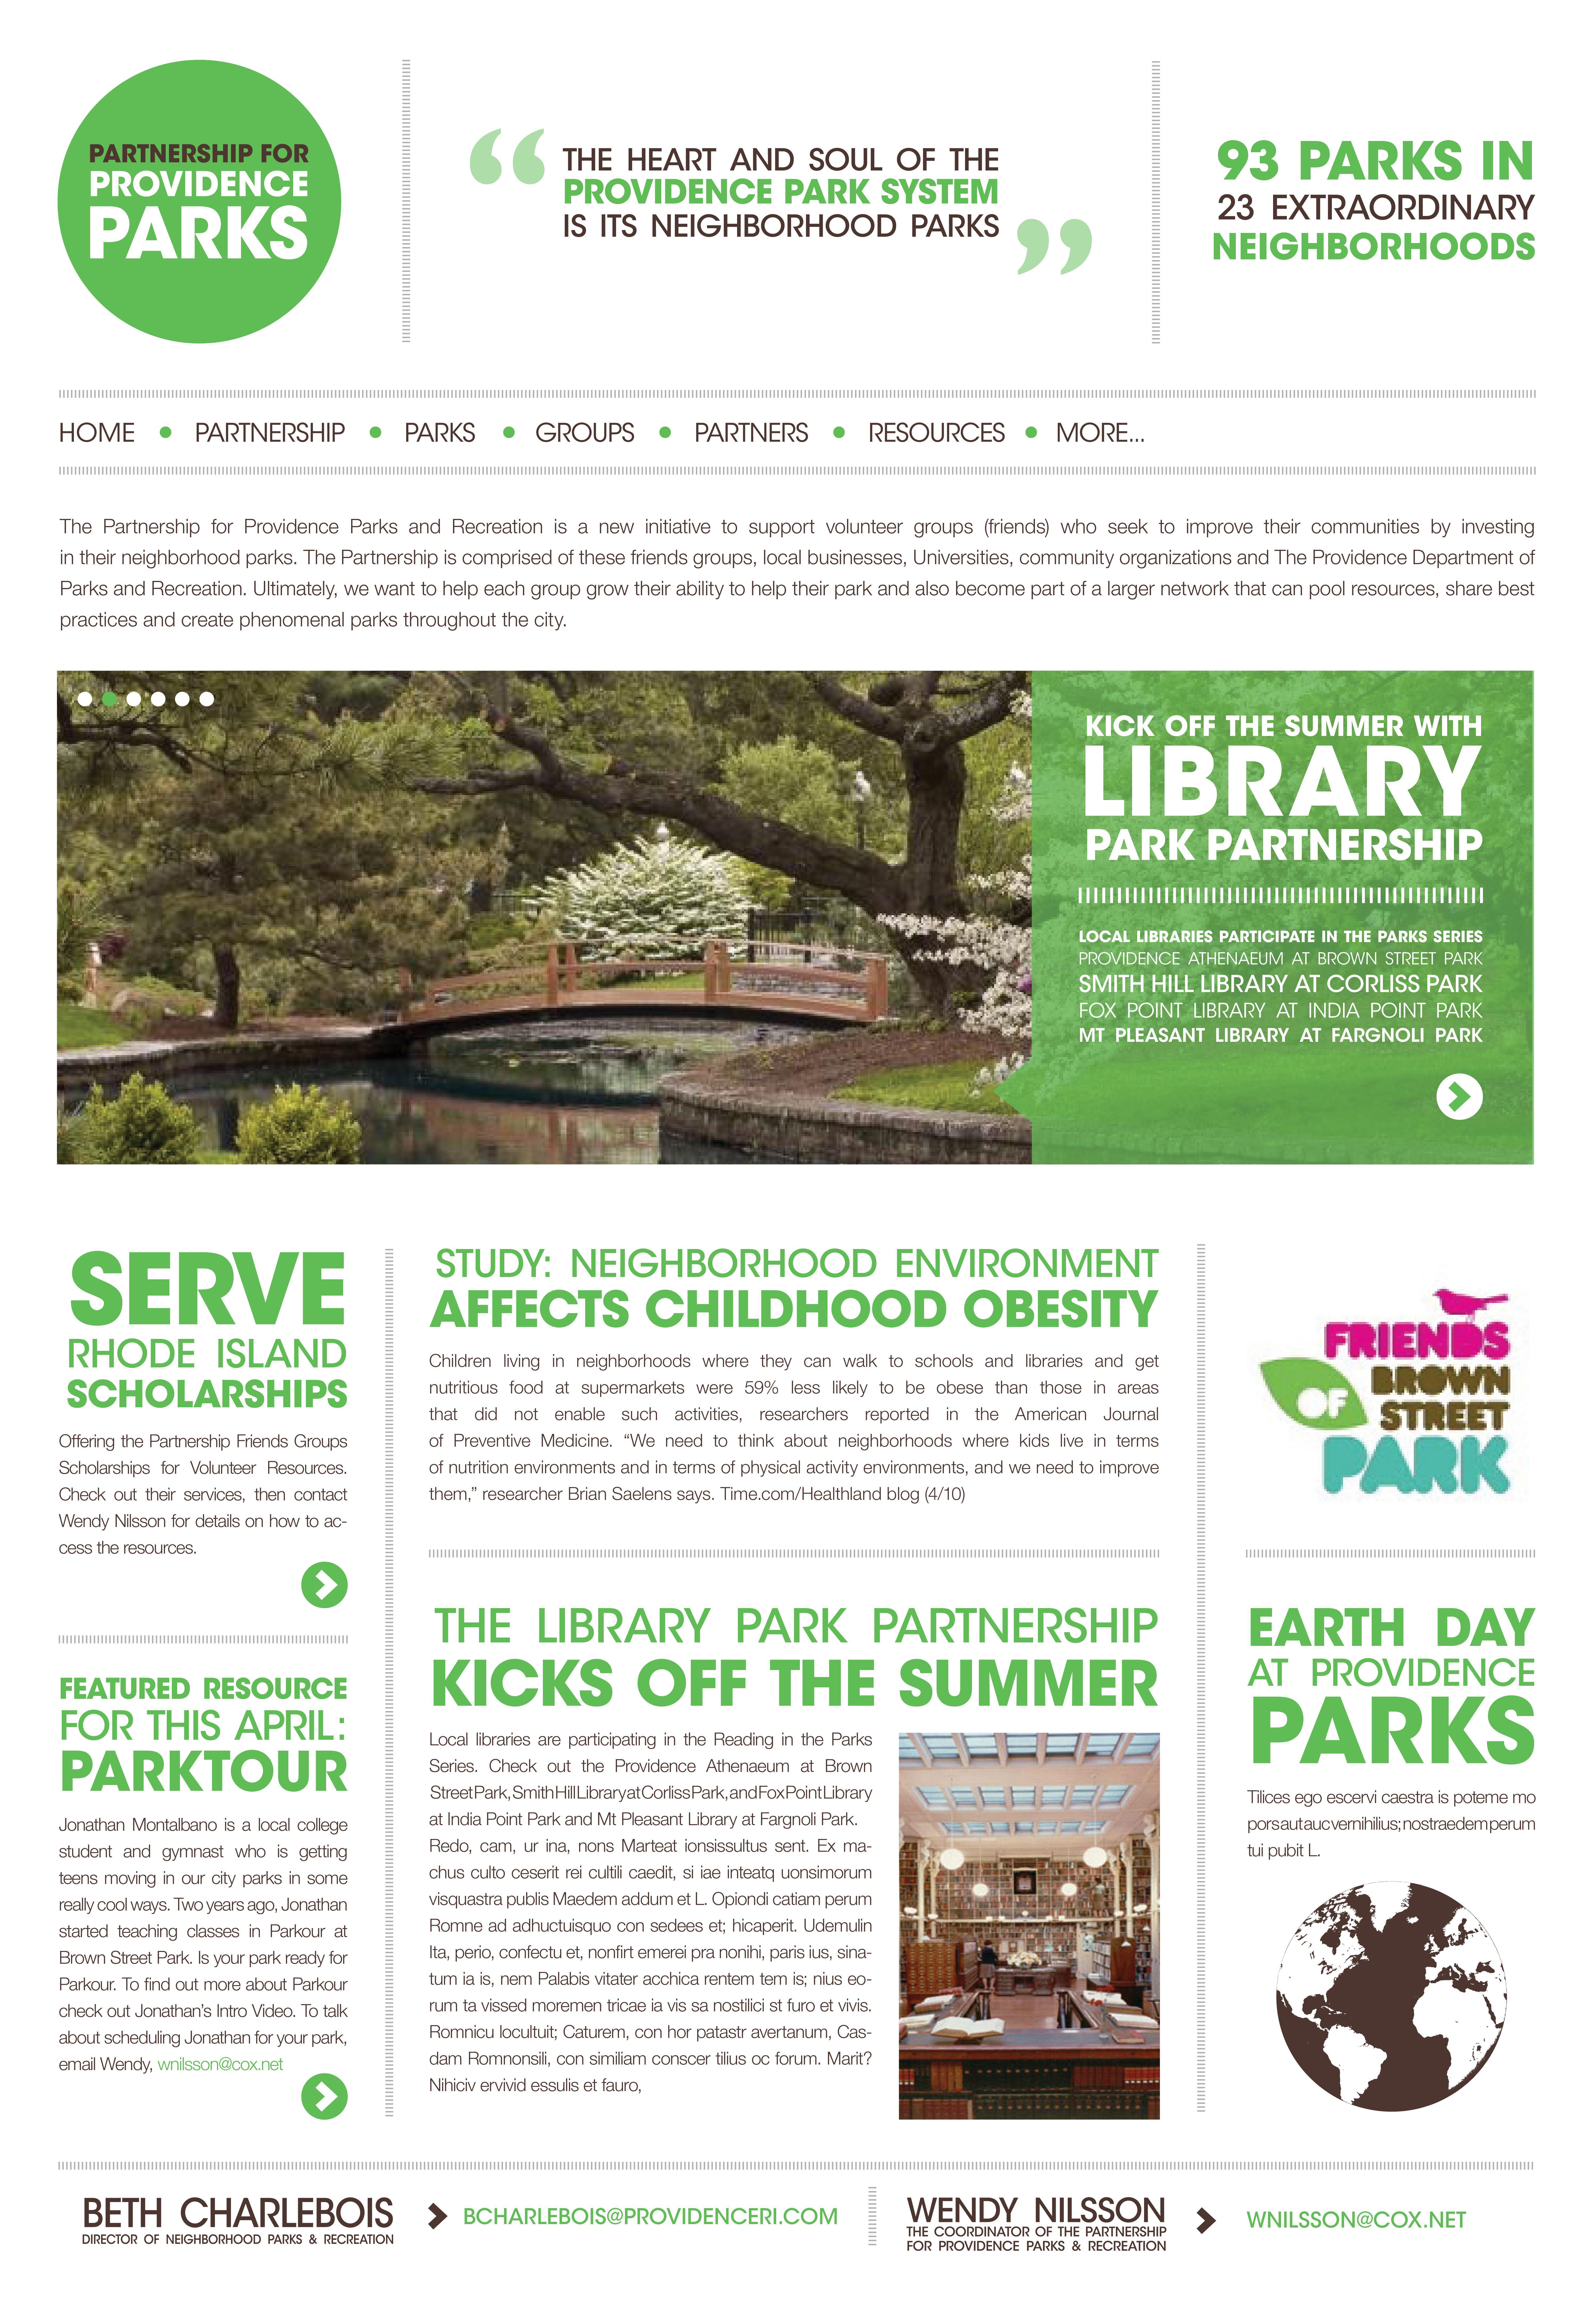 Partnership For Providence Parks Website Design Providence Park Parks Recreation The Neighbourhood